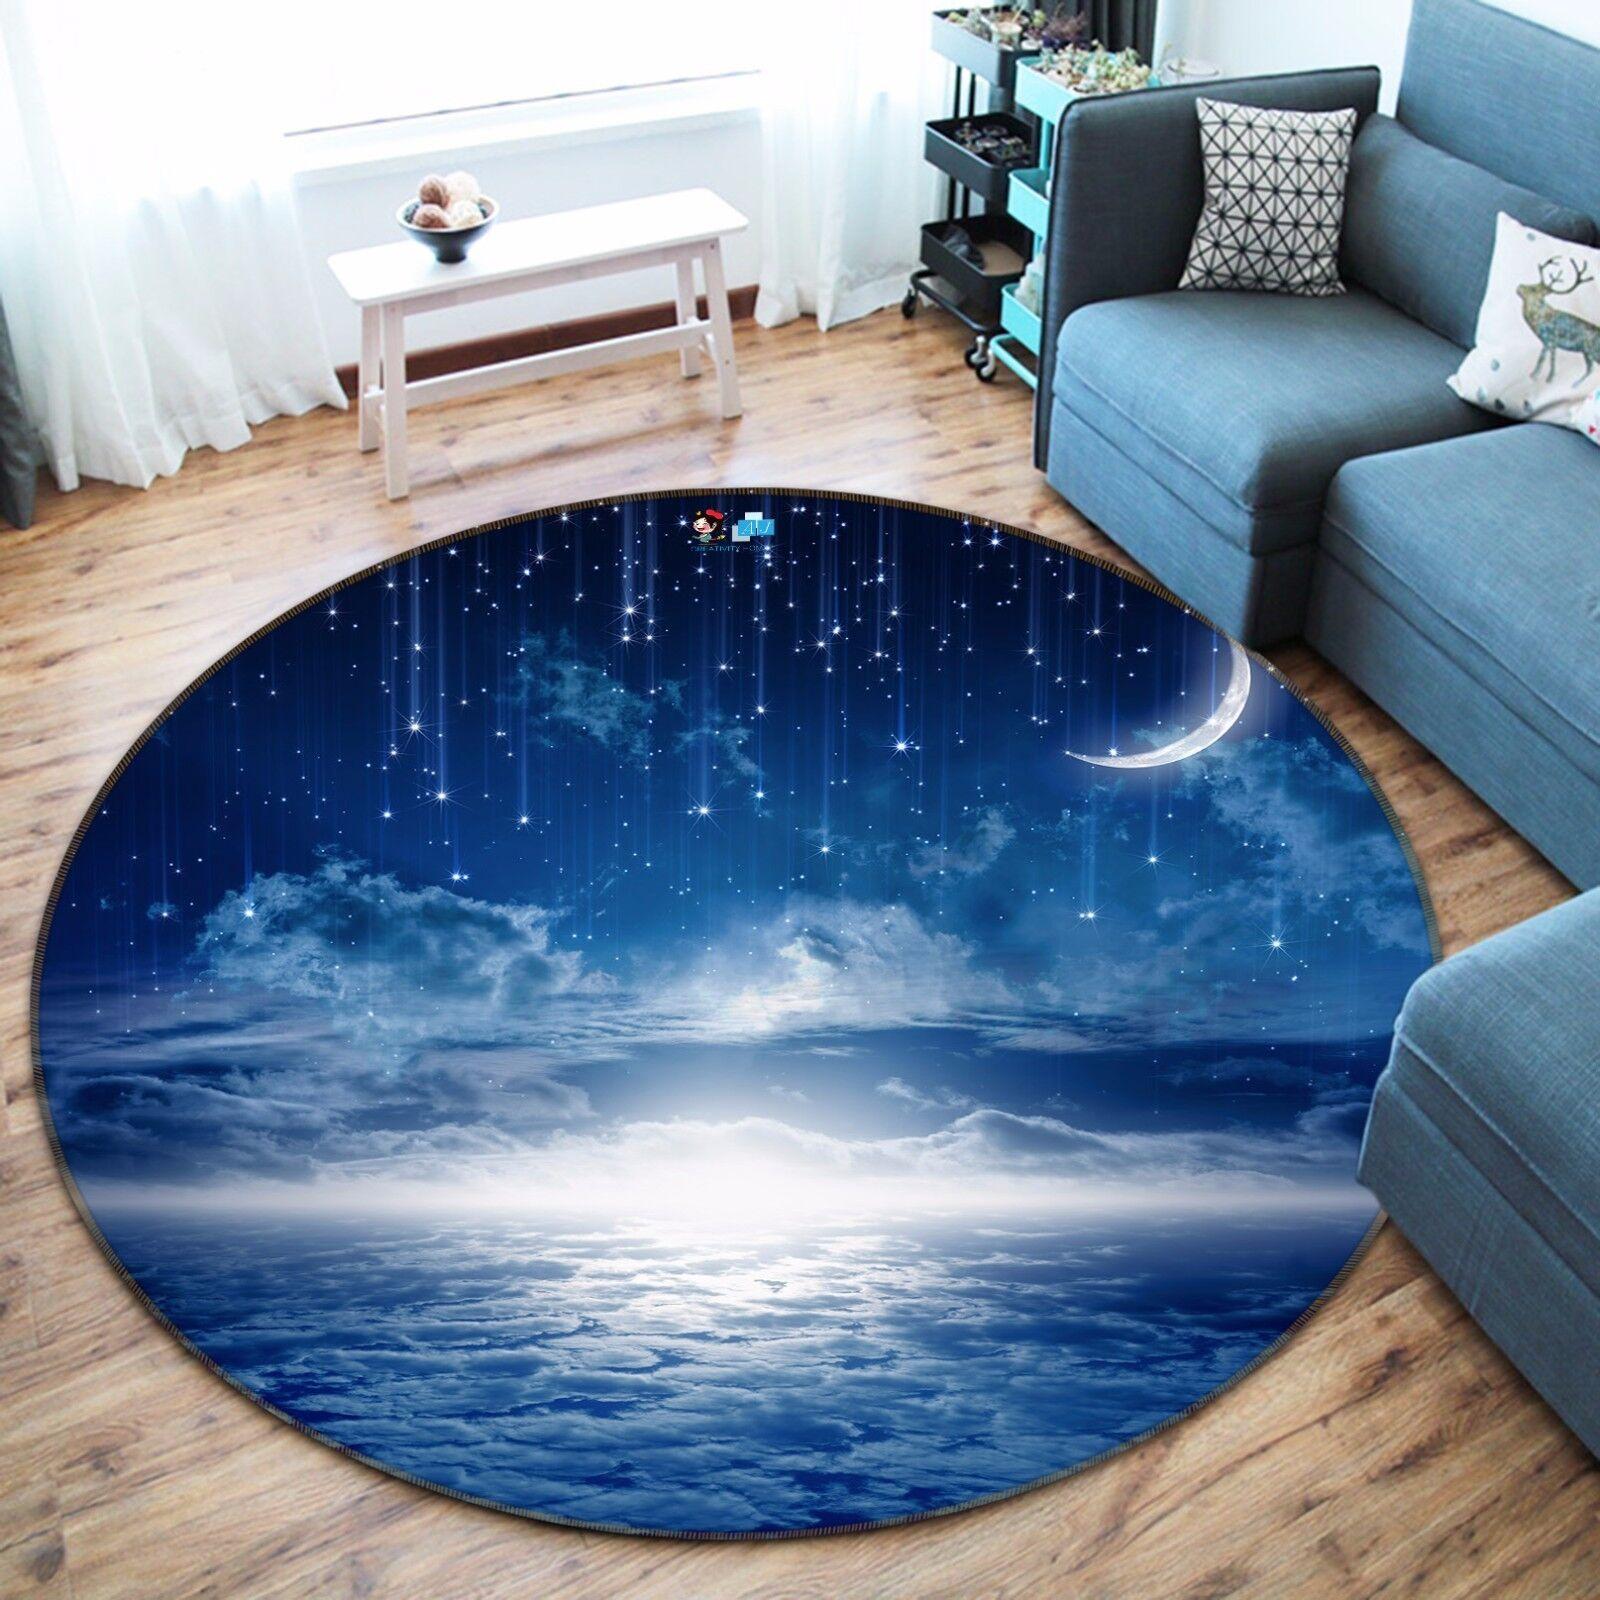 Tapis antidérapant 3D Meteor Sky 56 Tapis de sol Tapis rond qualité Photo Carpet Photo CA